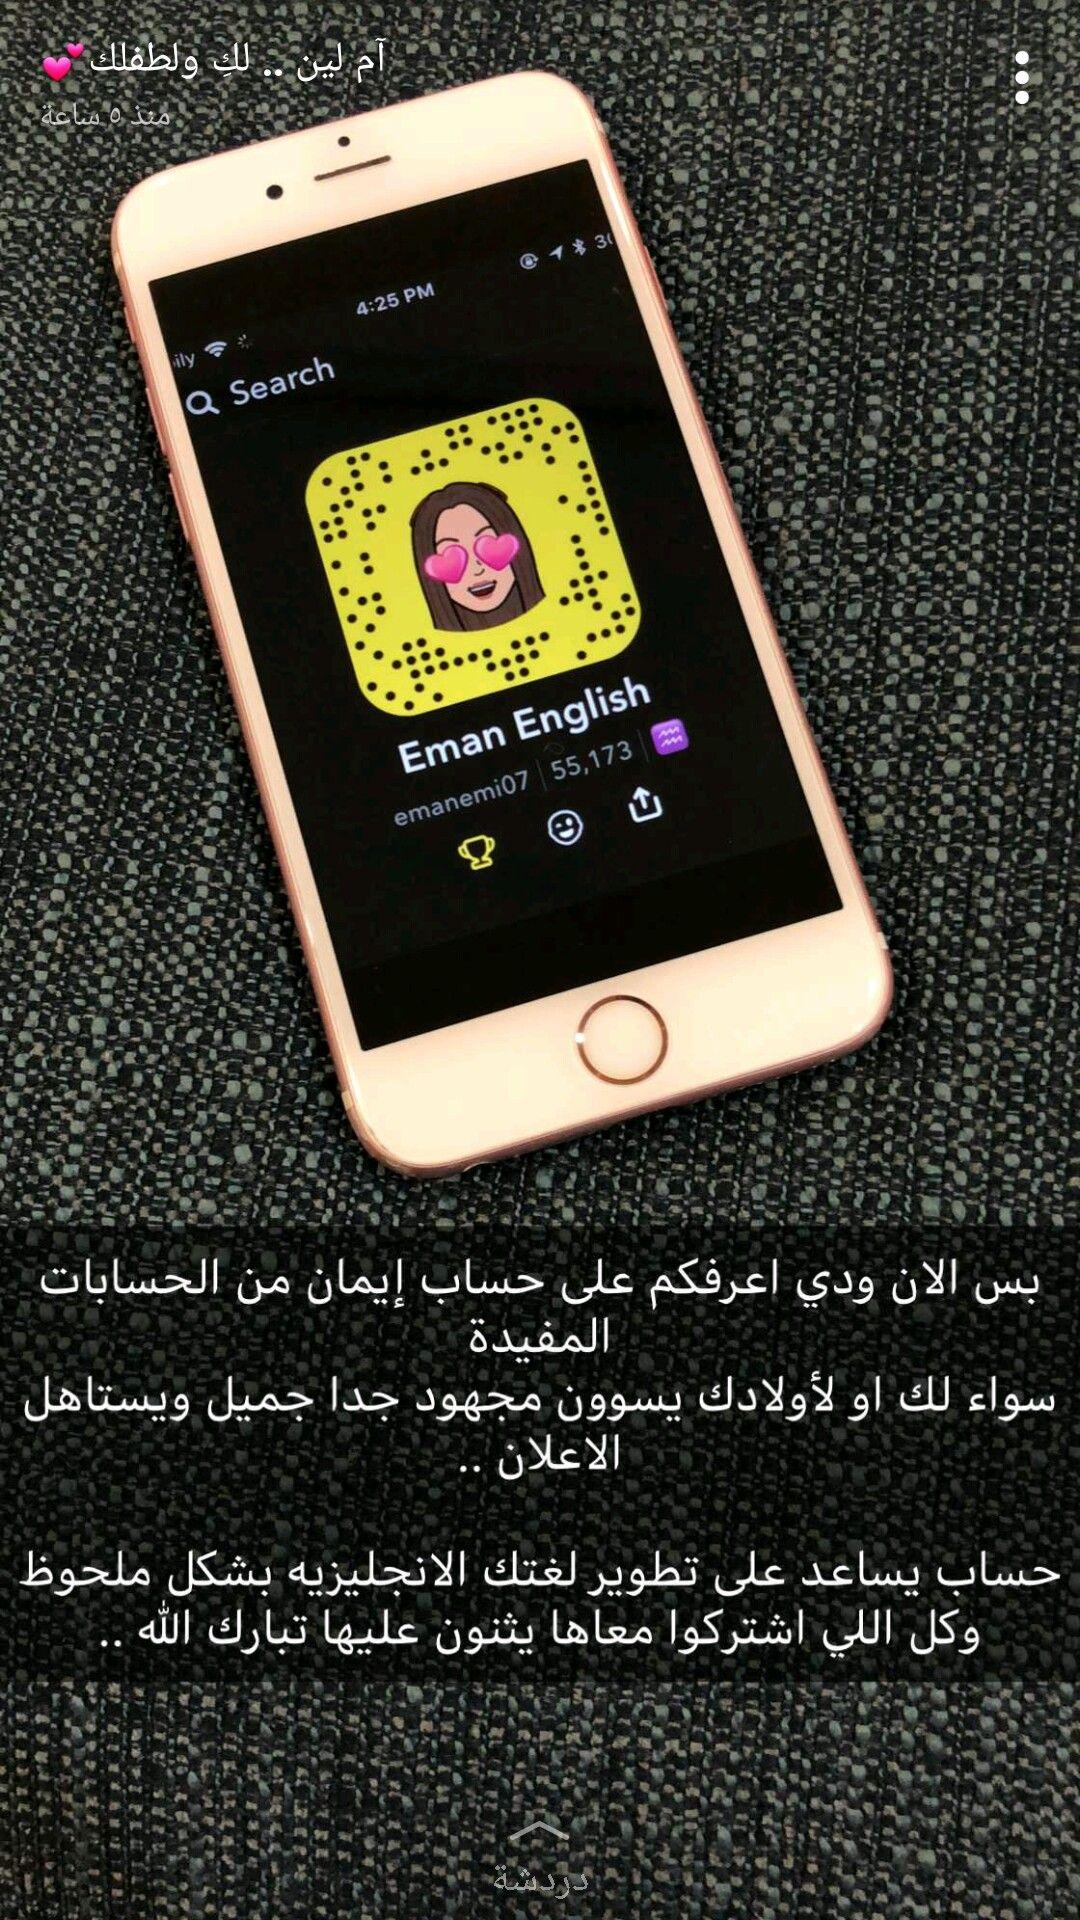 Pin By Hala Fwaz On تطبيقات وحسابات مفيدة App Phone Phone Cases